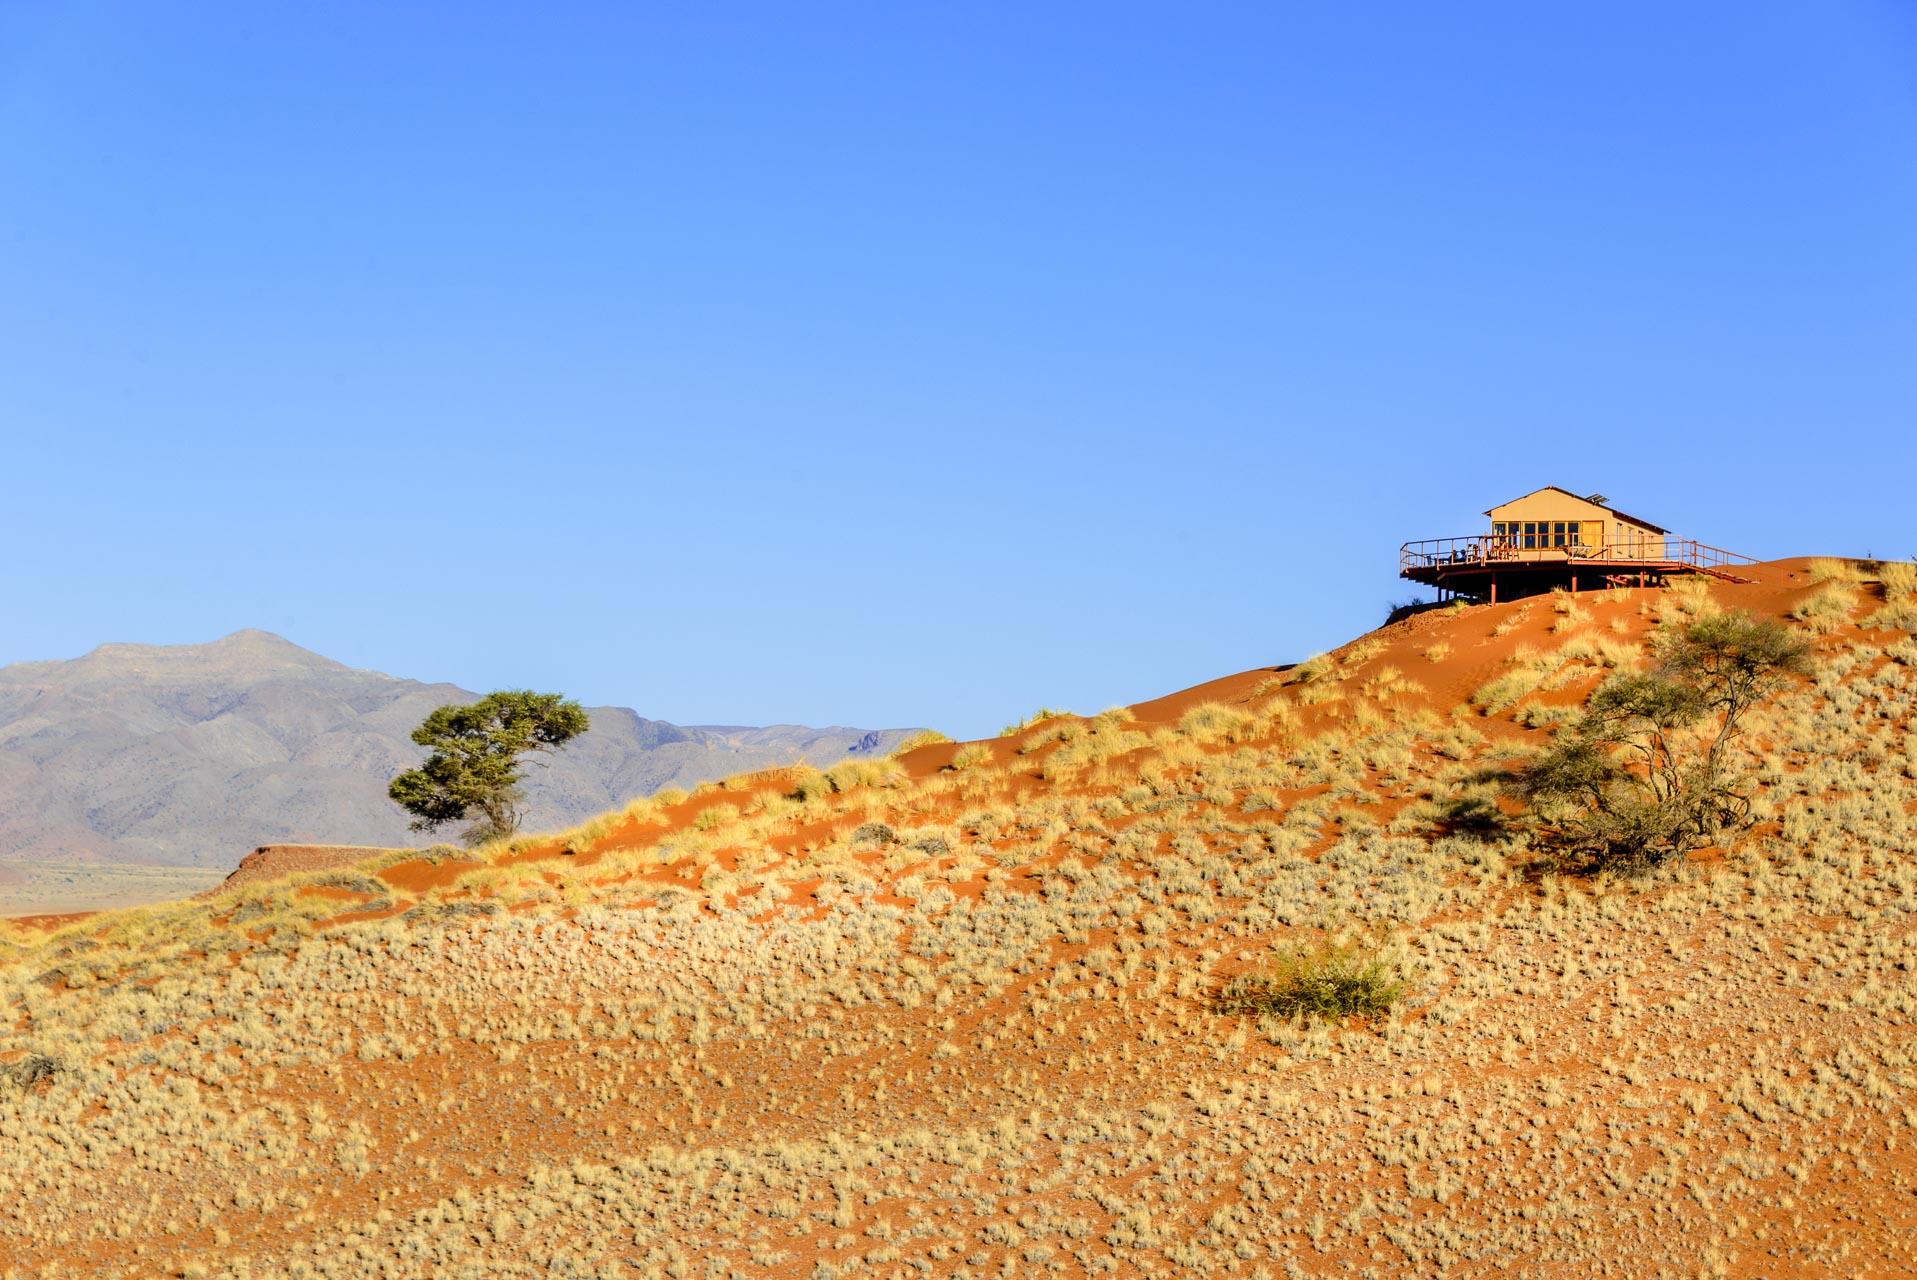 Namib-Dune-Star-Camp-13